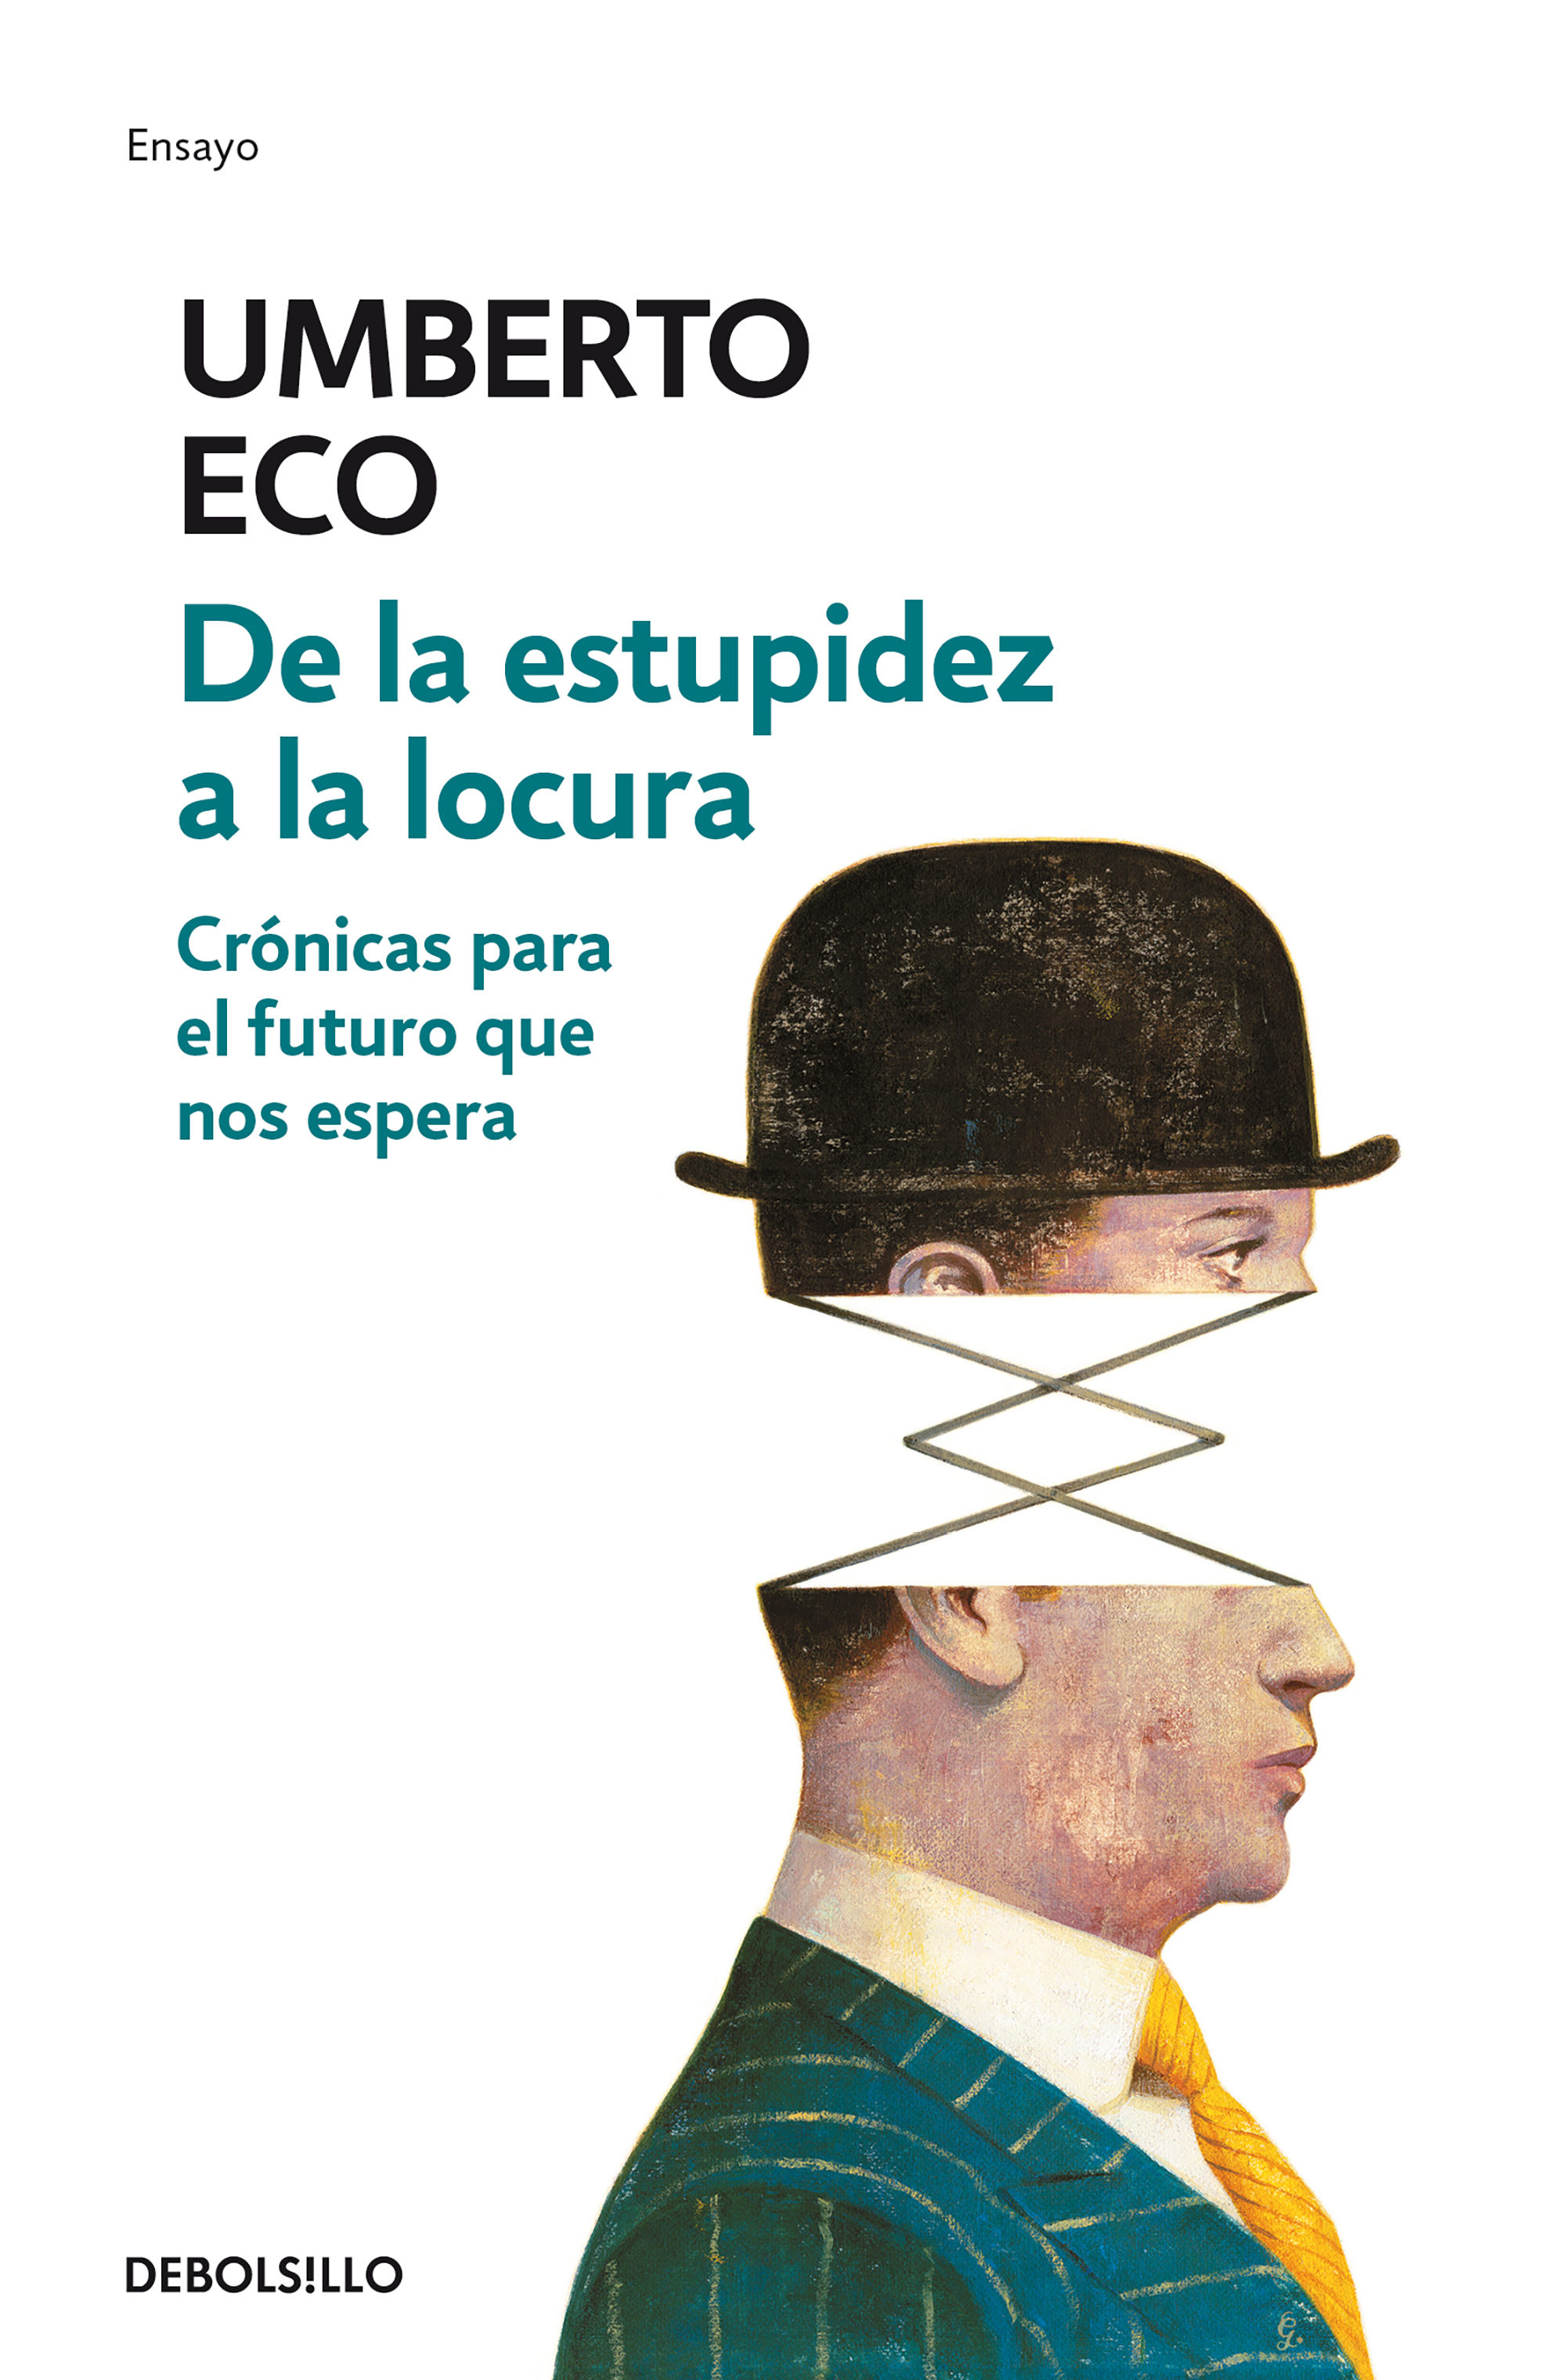 De la Estupidez a la Locura - Umberto Eco - Debolsillo